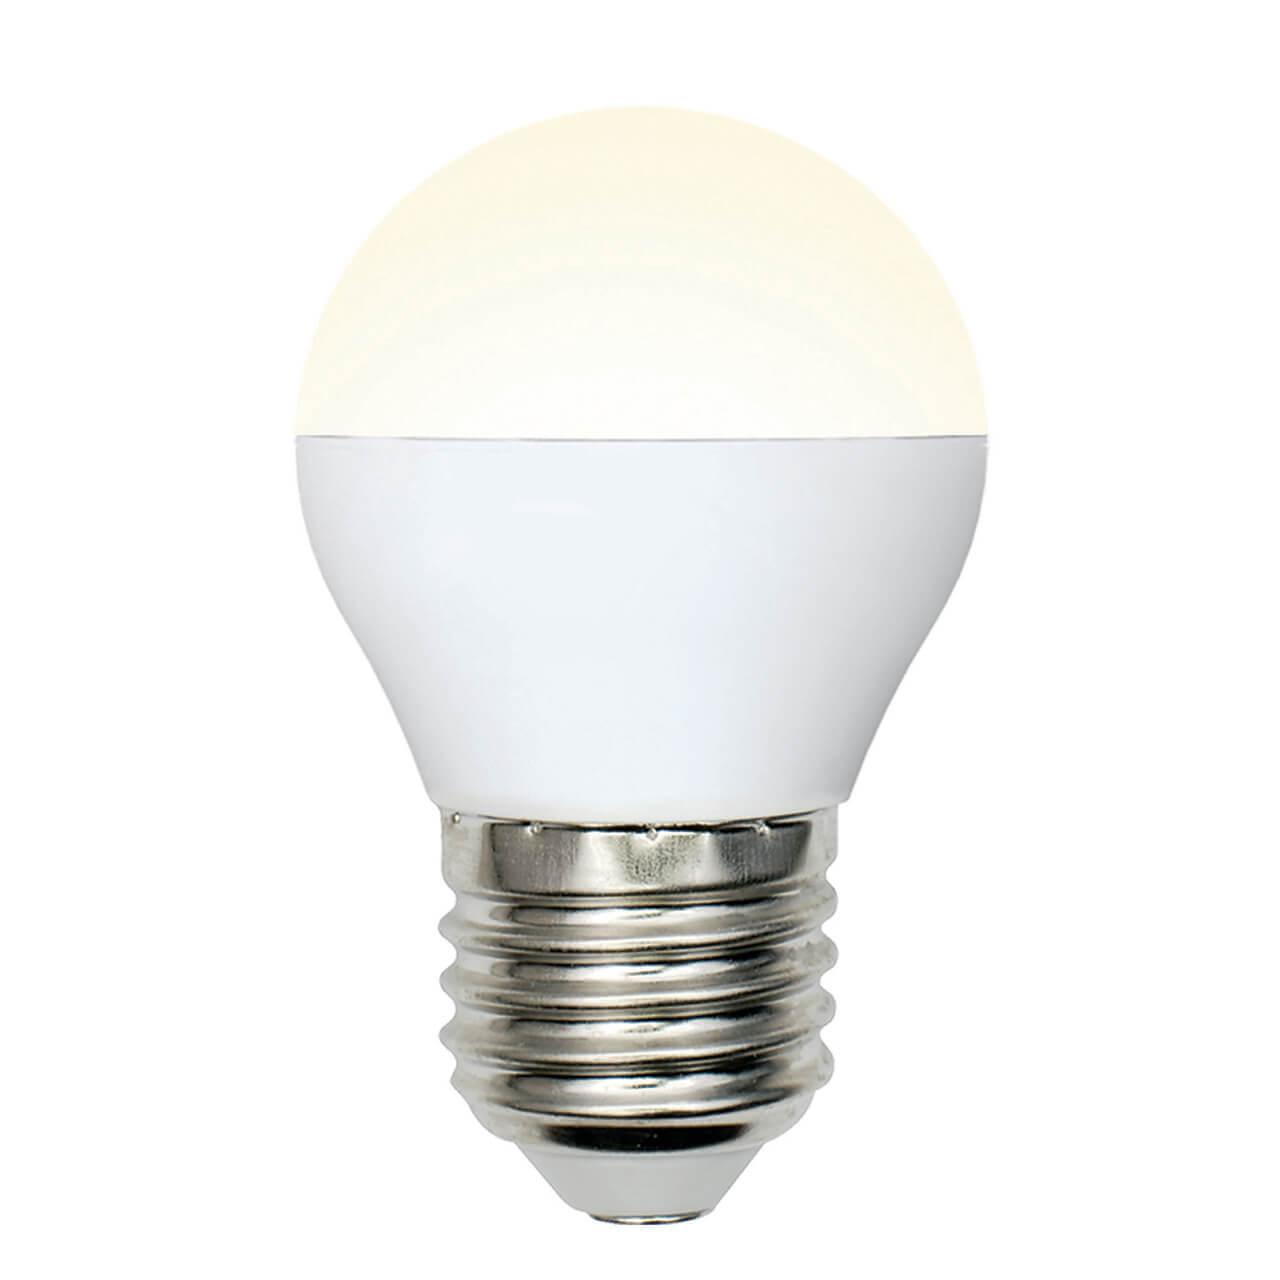 цена на Лампа светодиодная (UL-00002377) E27 6W 3000K матовая LED-G45-6W/WW/E27/FR/MB PLM11WH